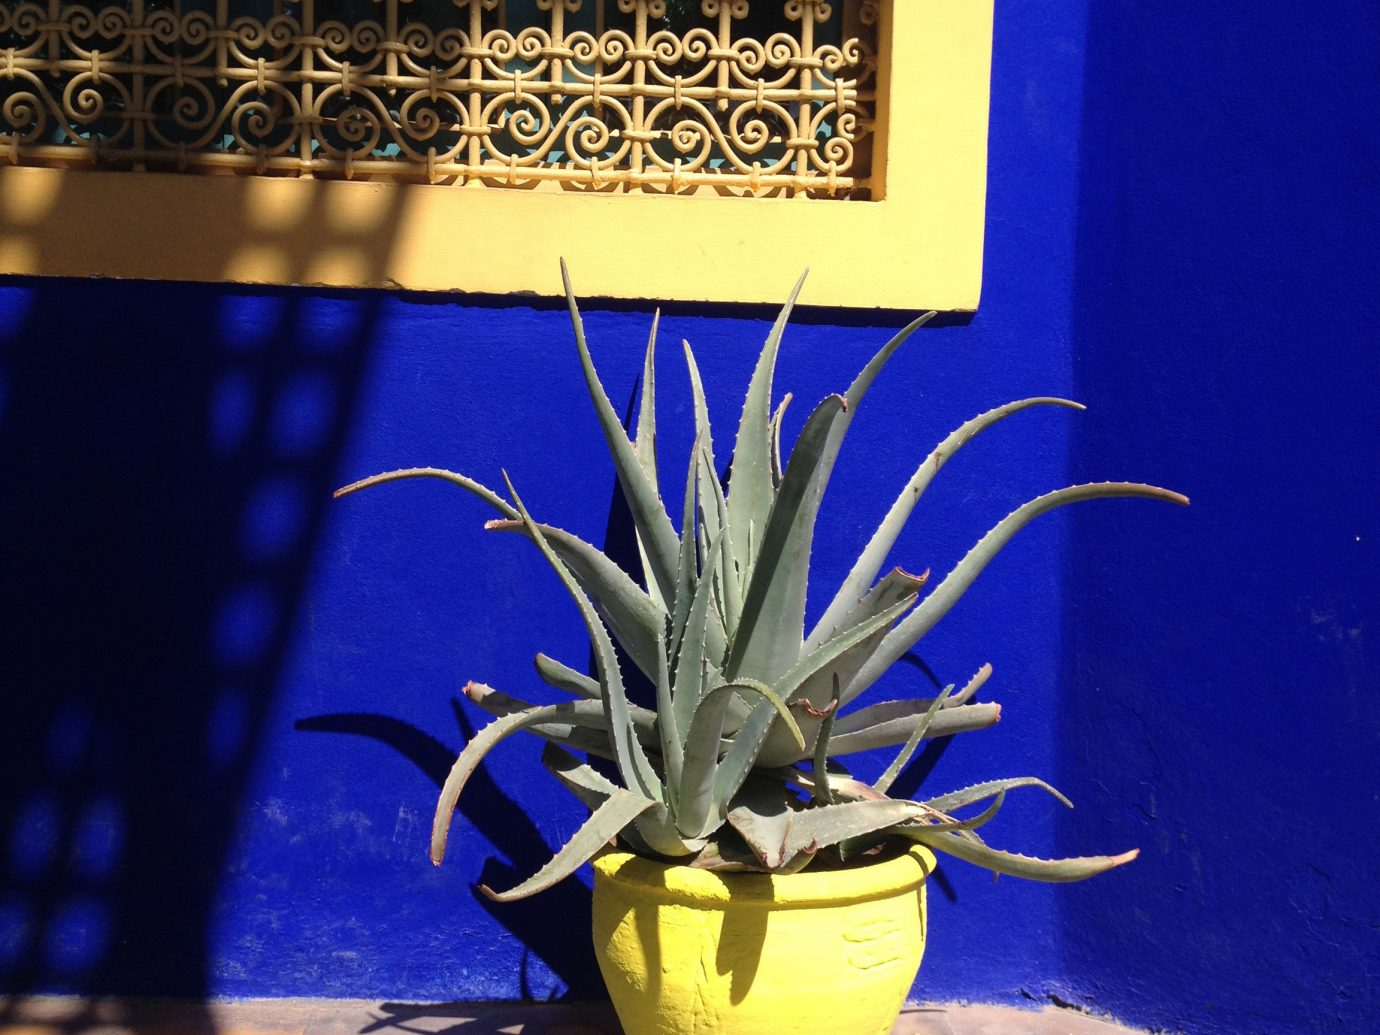 Trip Ideas color blue yellow night art flower lighting glass plant